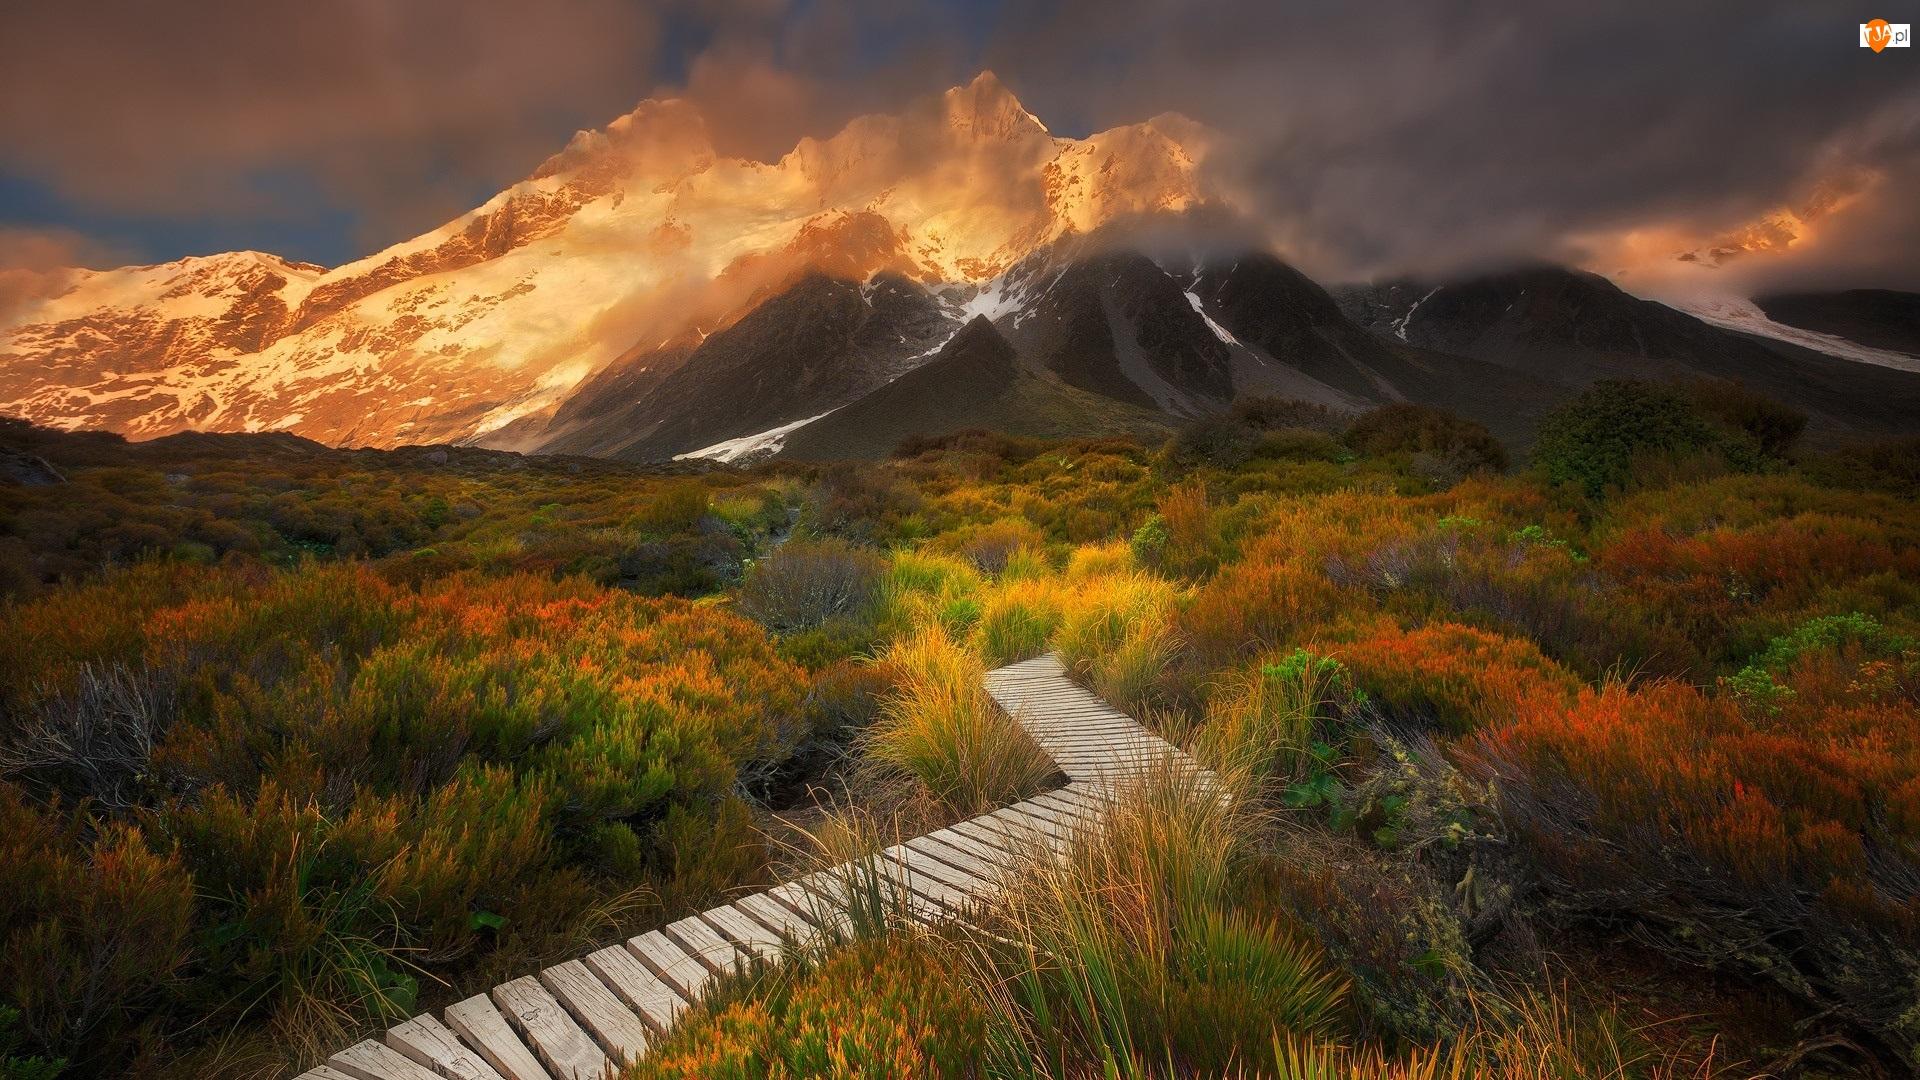 Roślinność, Góry, Park Narodowy Góry Cooka, Nowa Zelandia, Dróżka, Szlak Hooker Valley, Góra Cooka